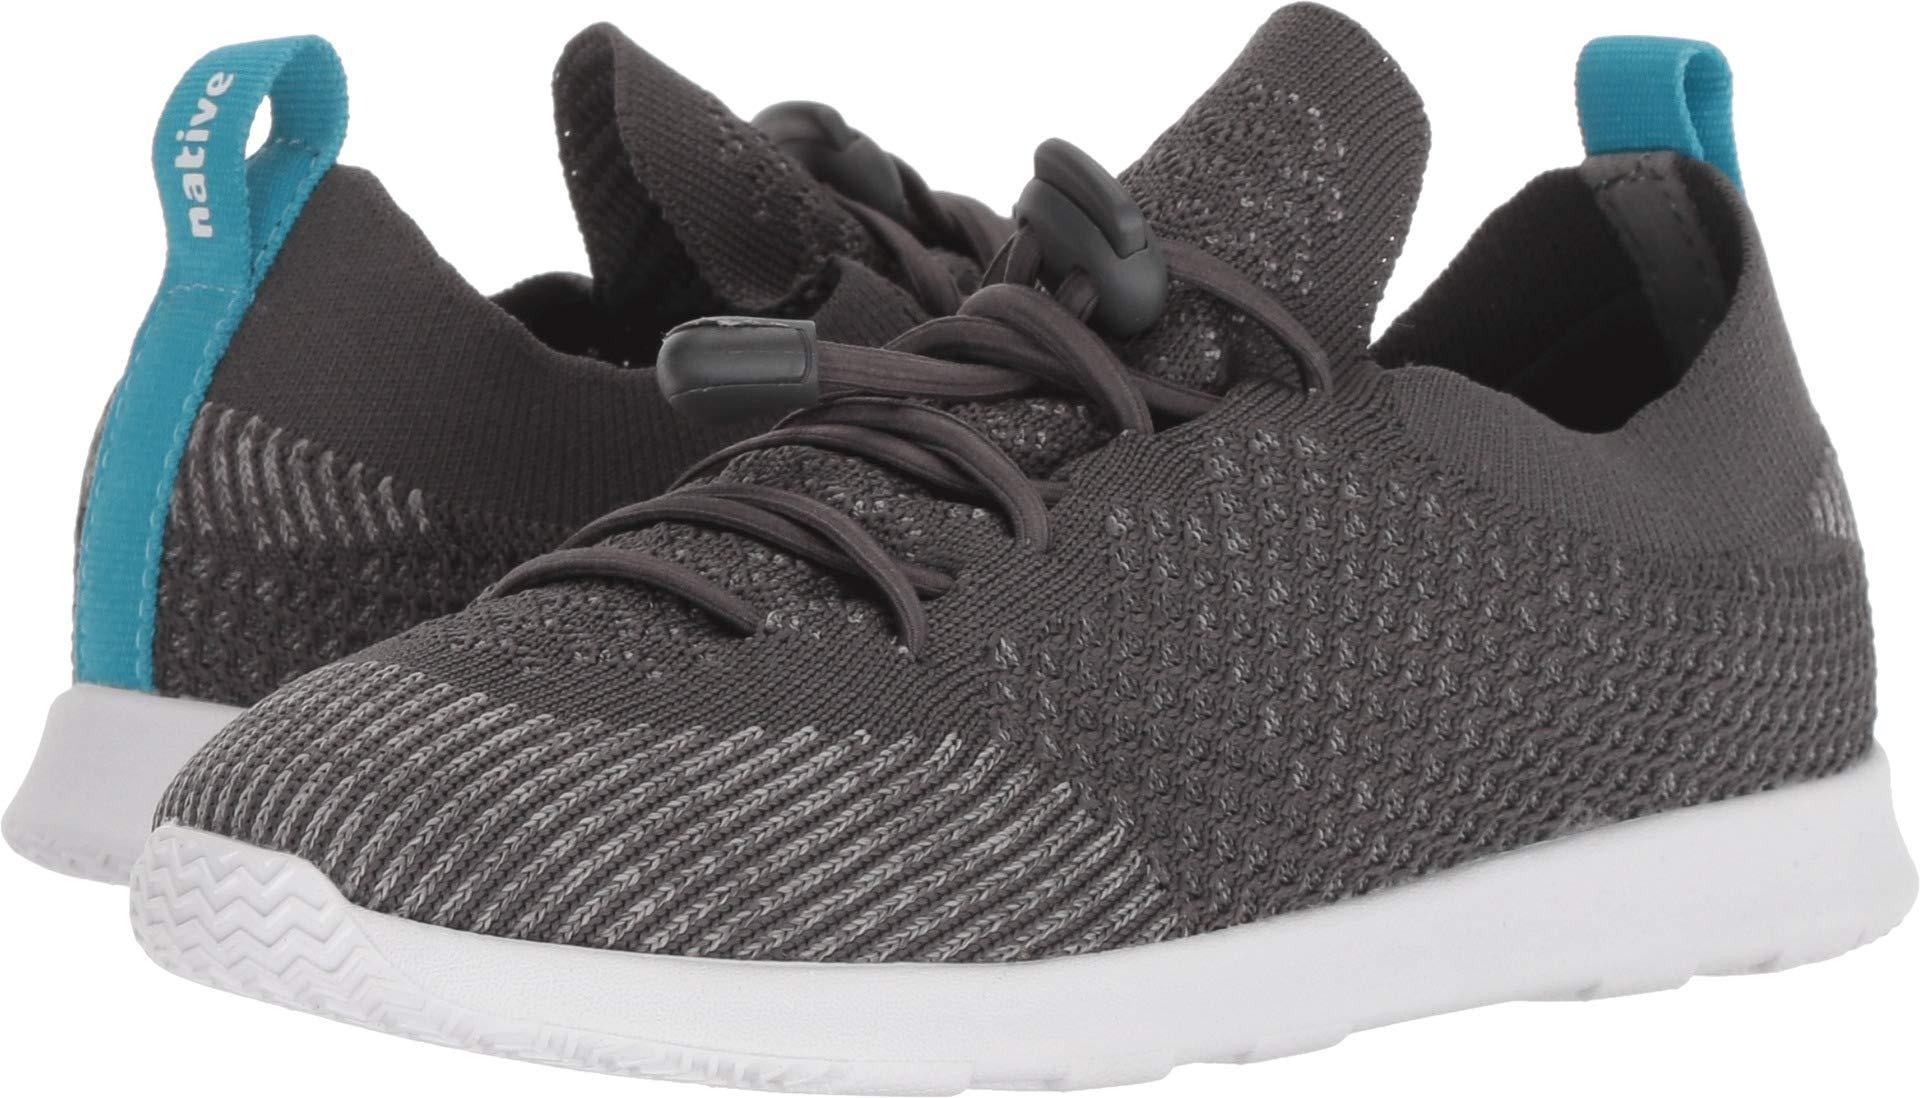 Native Kids Shoes Unisex AP Mercury Liteknit Toggle (Little Kid/Big Kid) Dublin Grey/Shell White 3 M US Little Kid